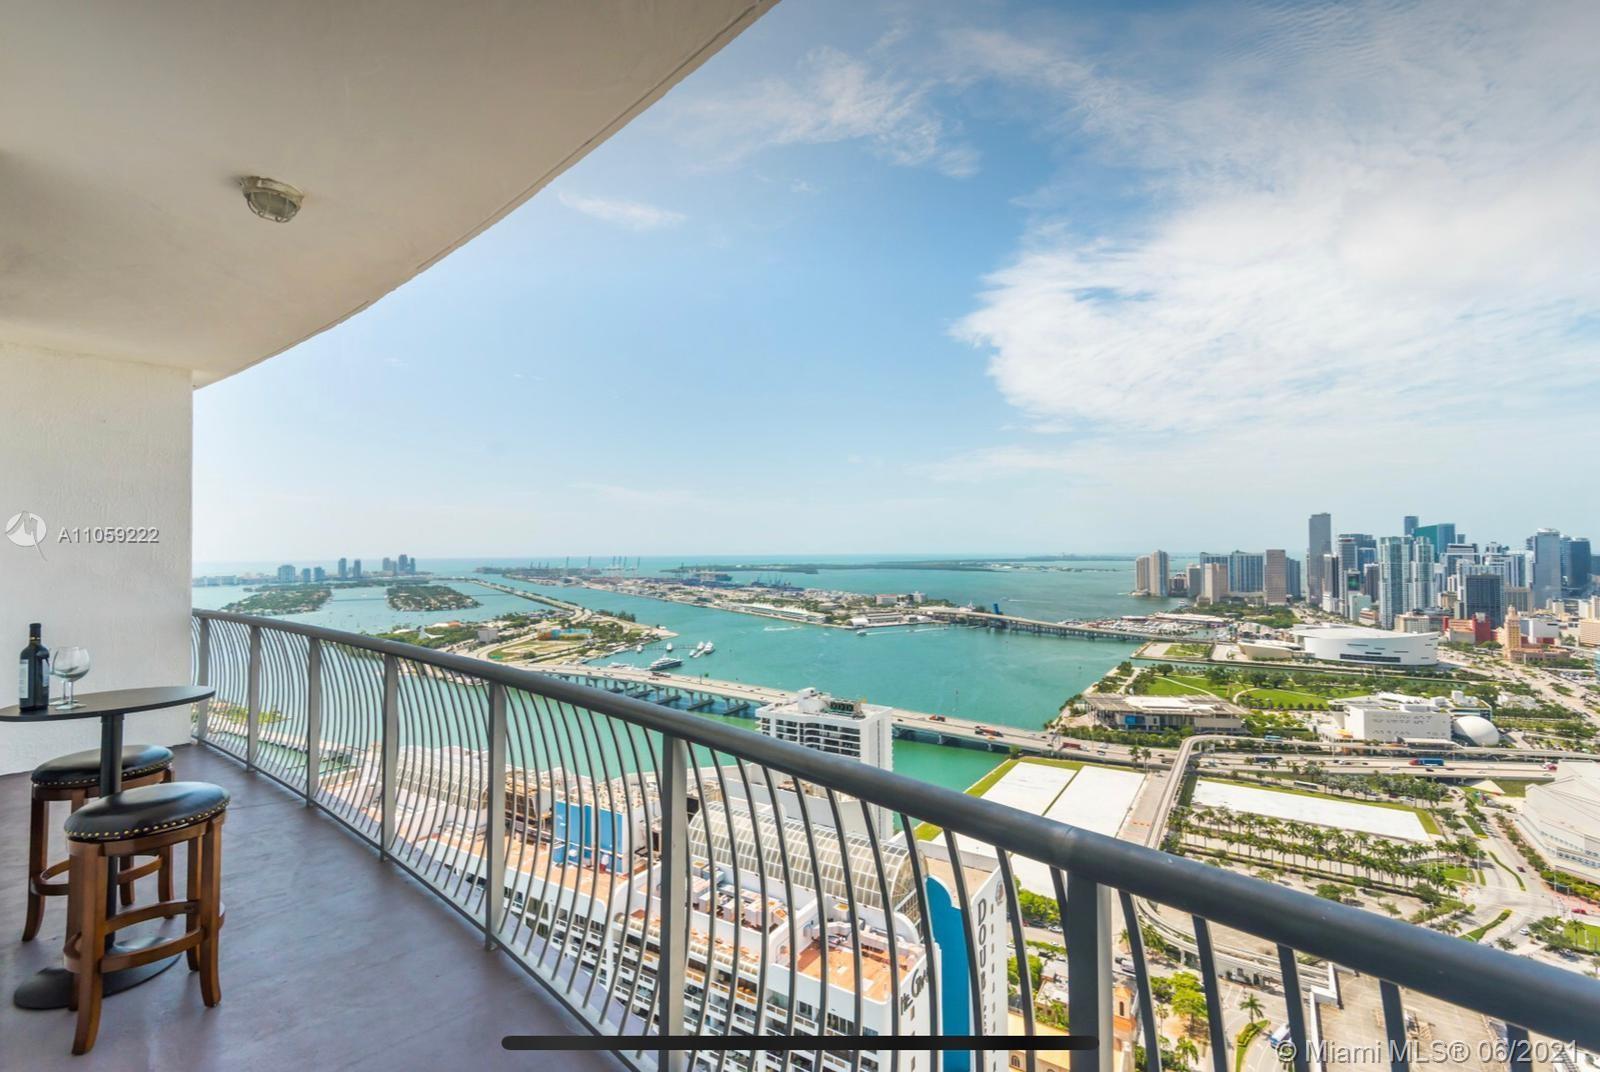 Opera Tower #5610 - 1750 N Bayshore Dr ST #5610, Miami, FL 33132